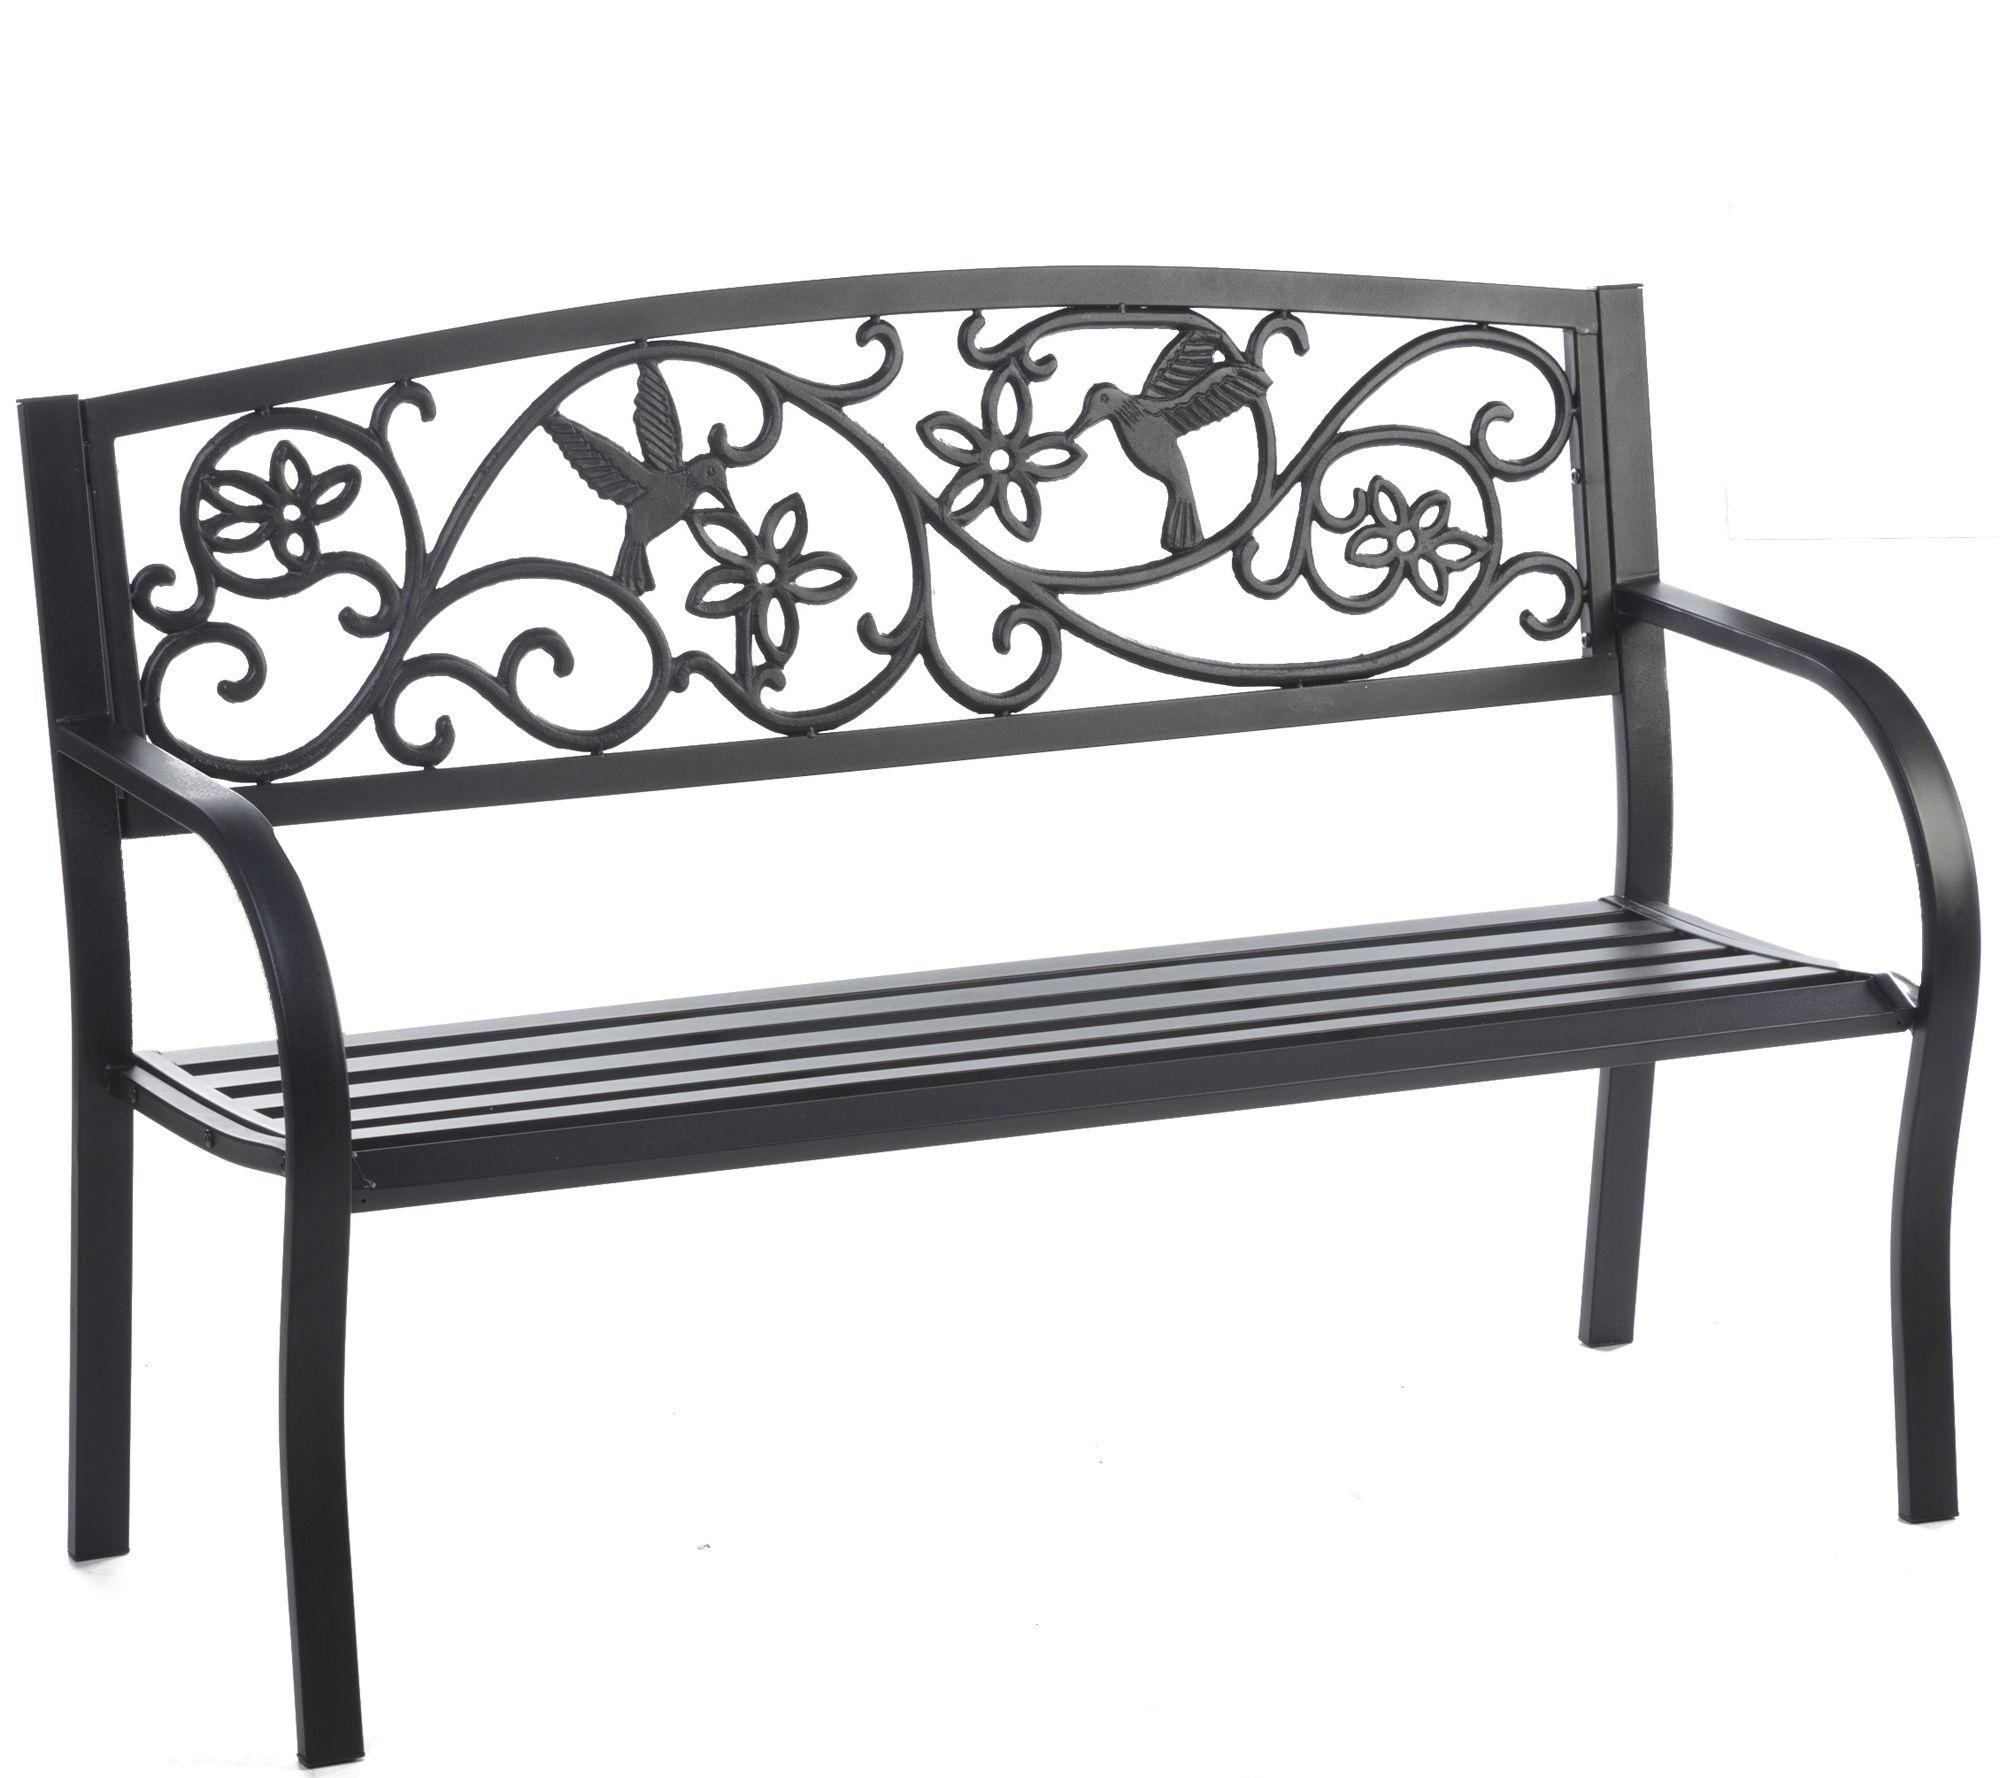 Plow And Hearth Furniture: Plow & Hearth Hummingbird Metal Garden Bench